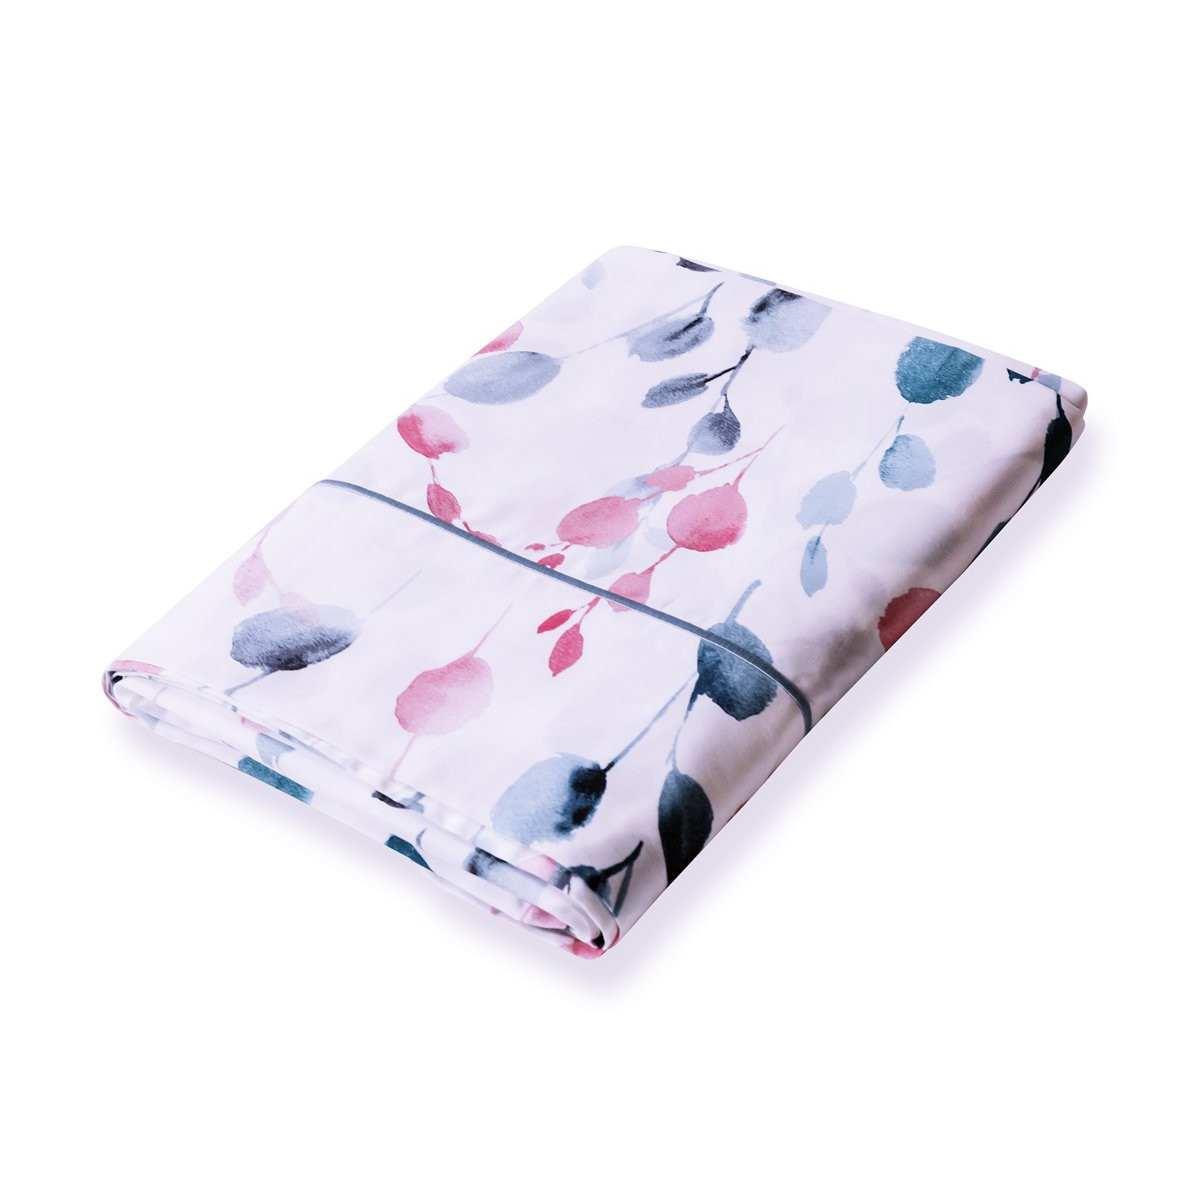 Sofia satin flat sheet